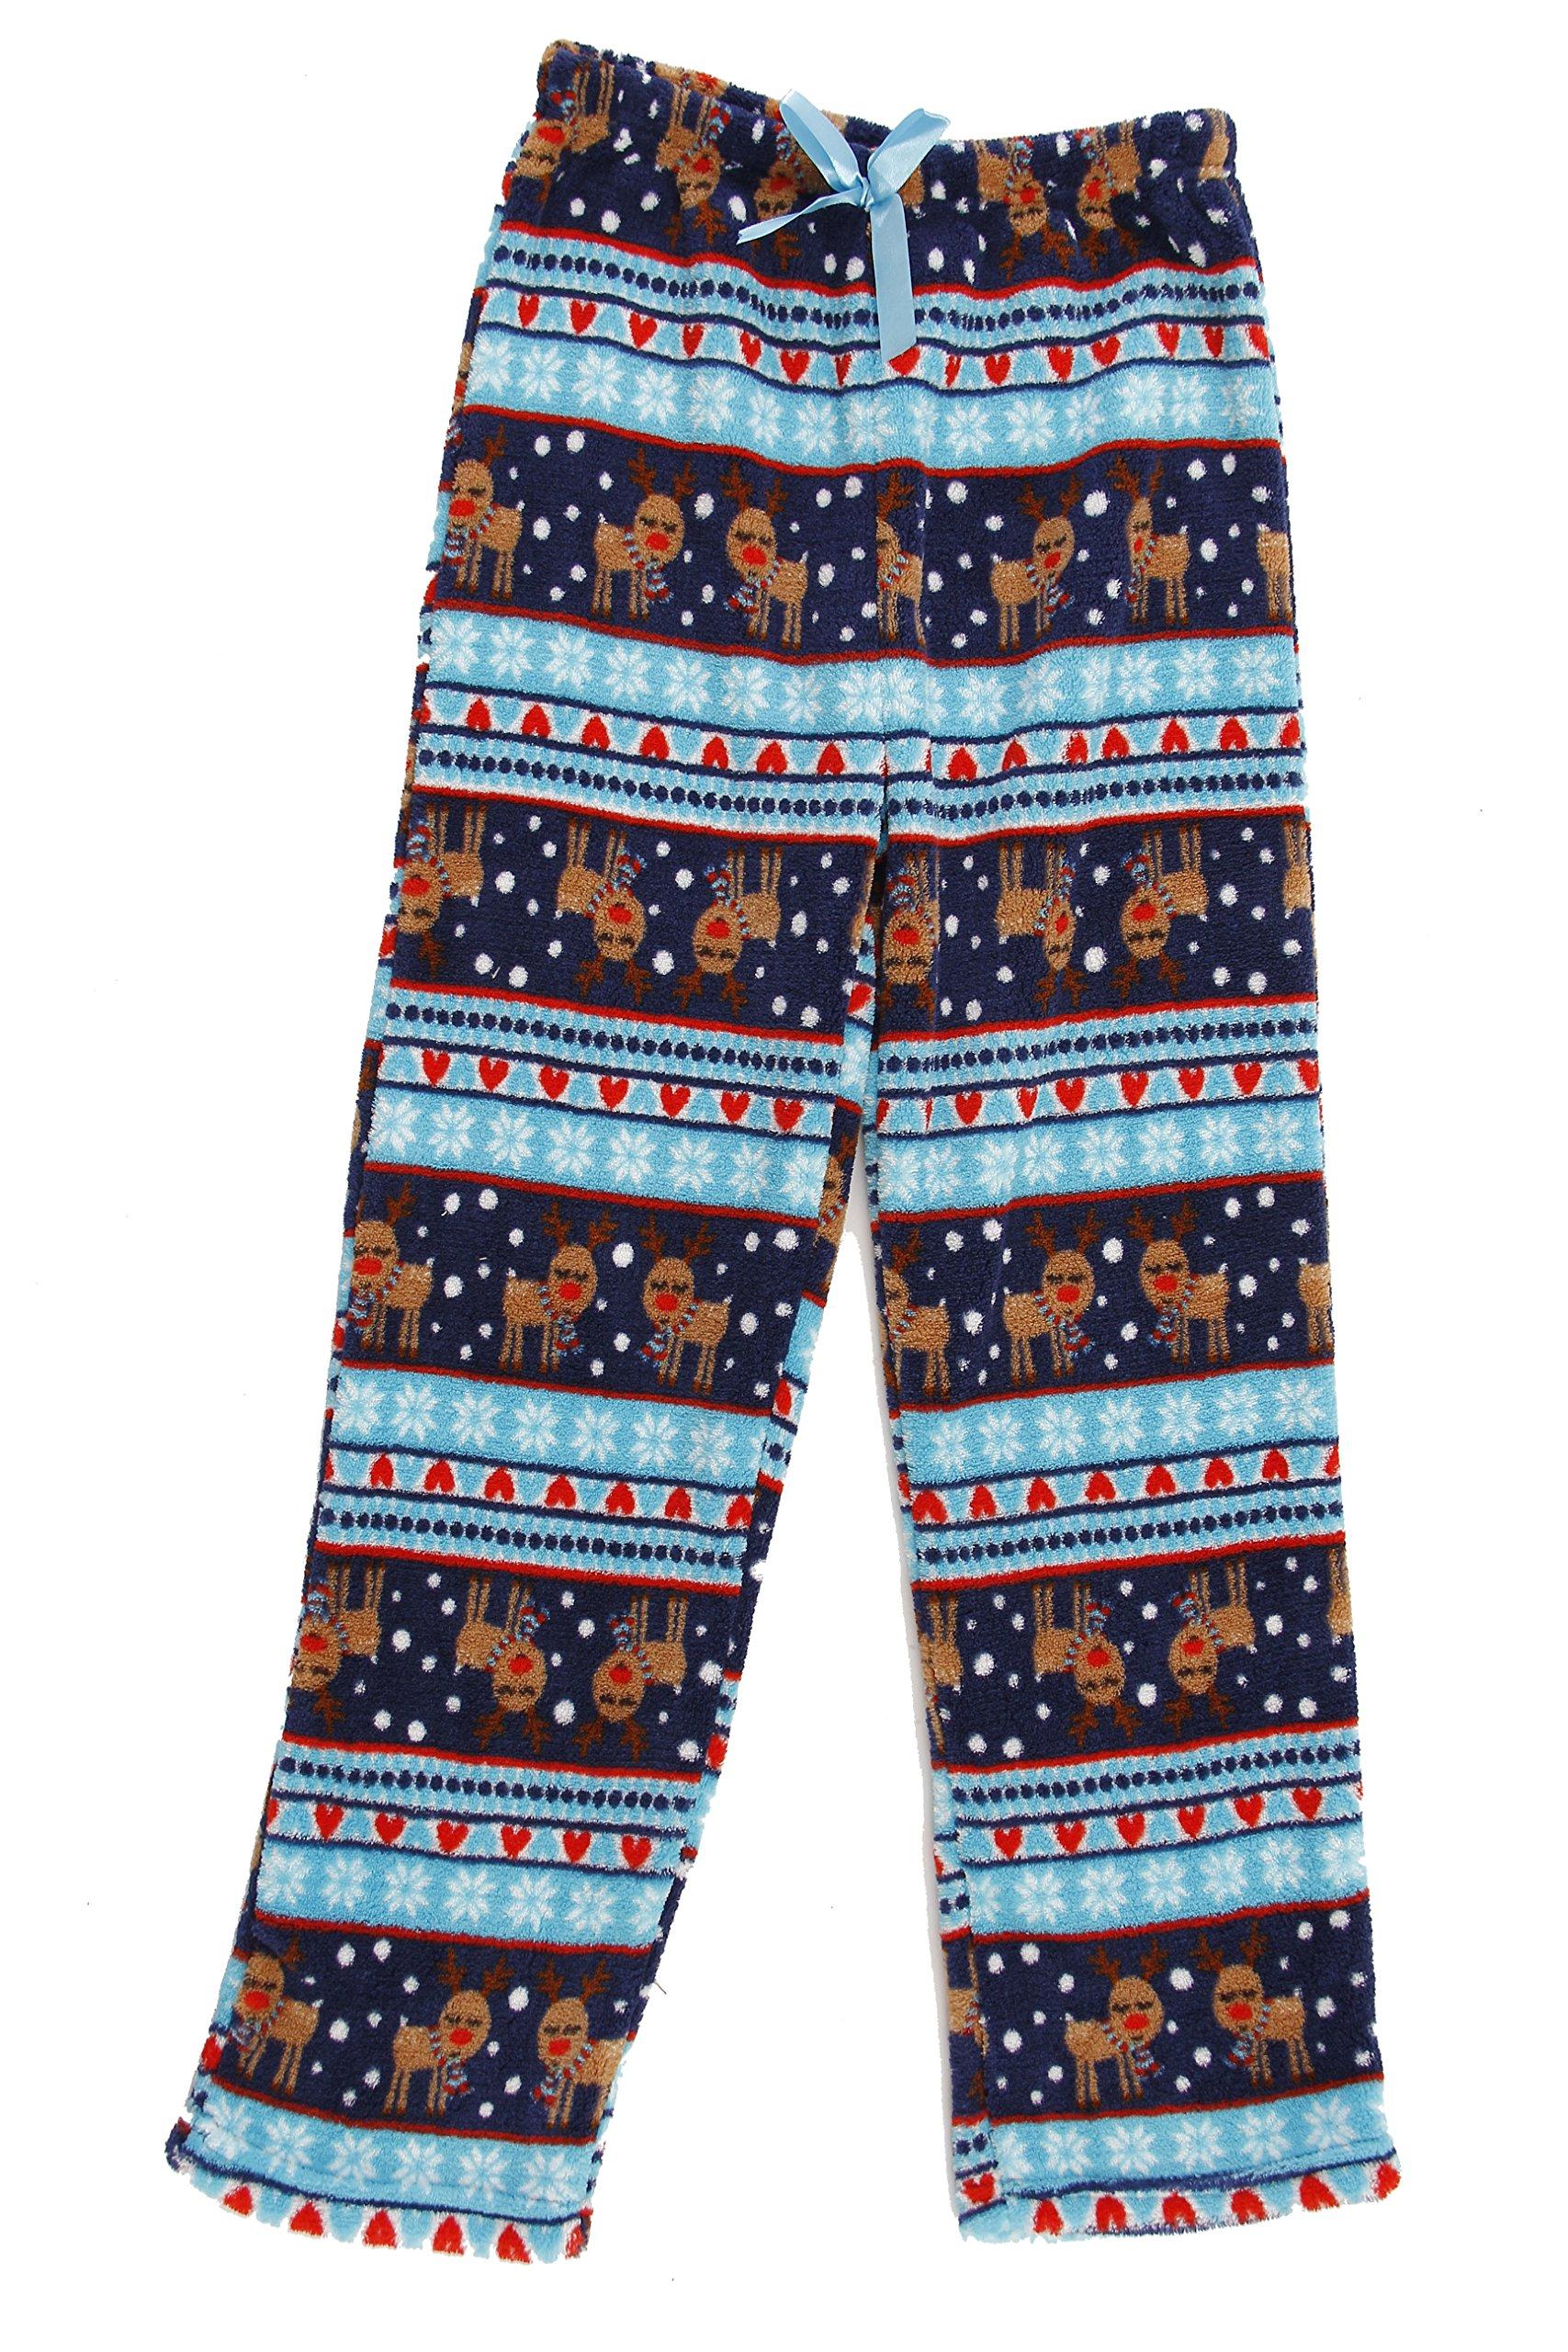 Just Love 45500-10129-14-16 Plush Pajama Pants for Girls